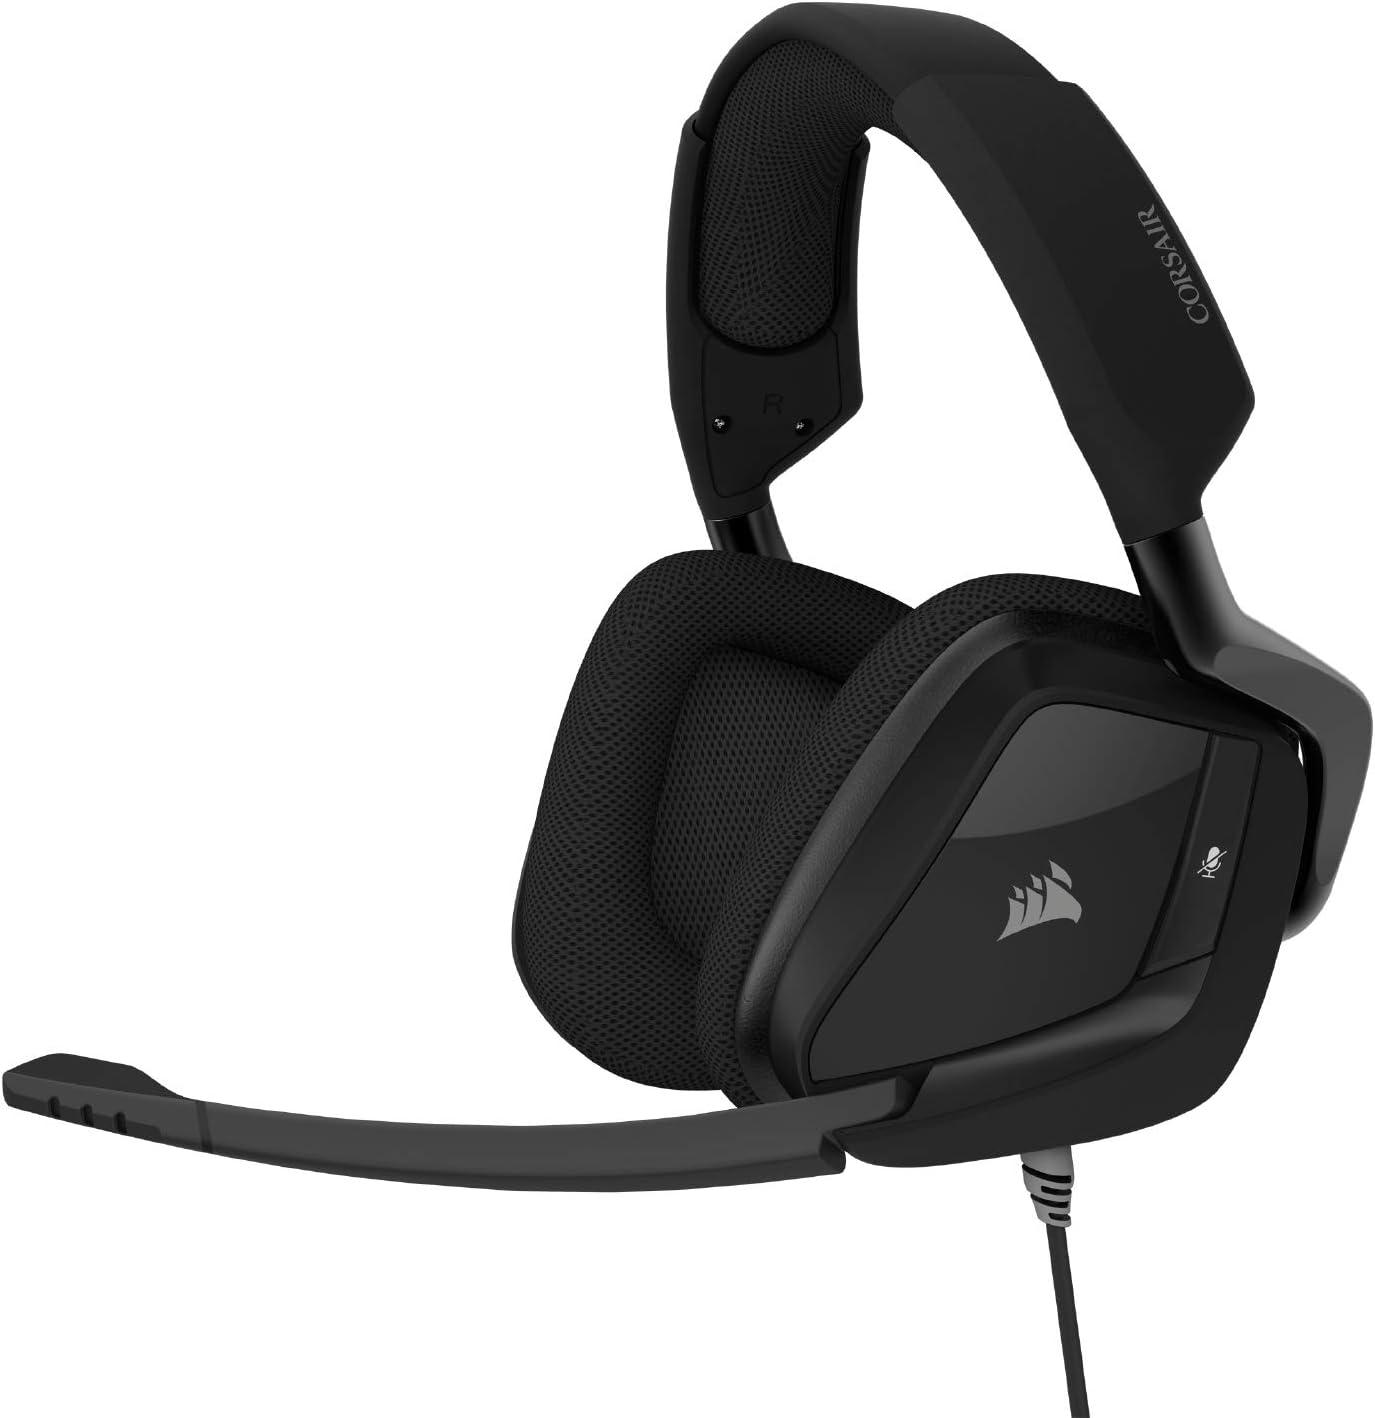 Corsair Void Elite Surround Premium Gaming Headset with 7.1 Surround Sound, Carbon